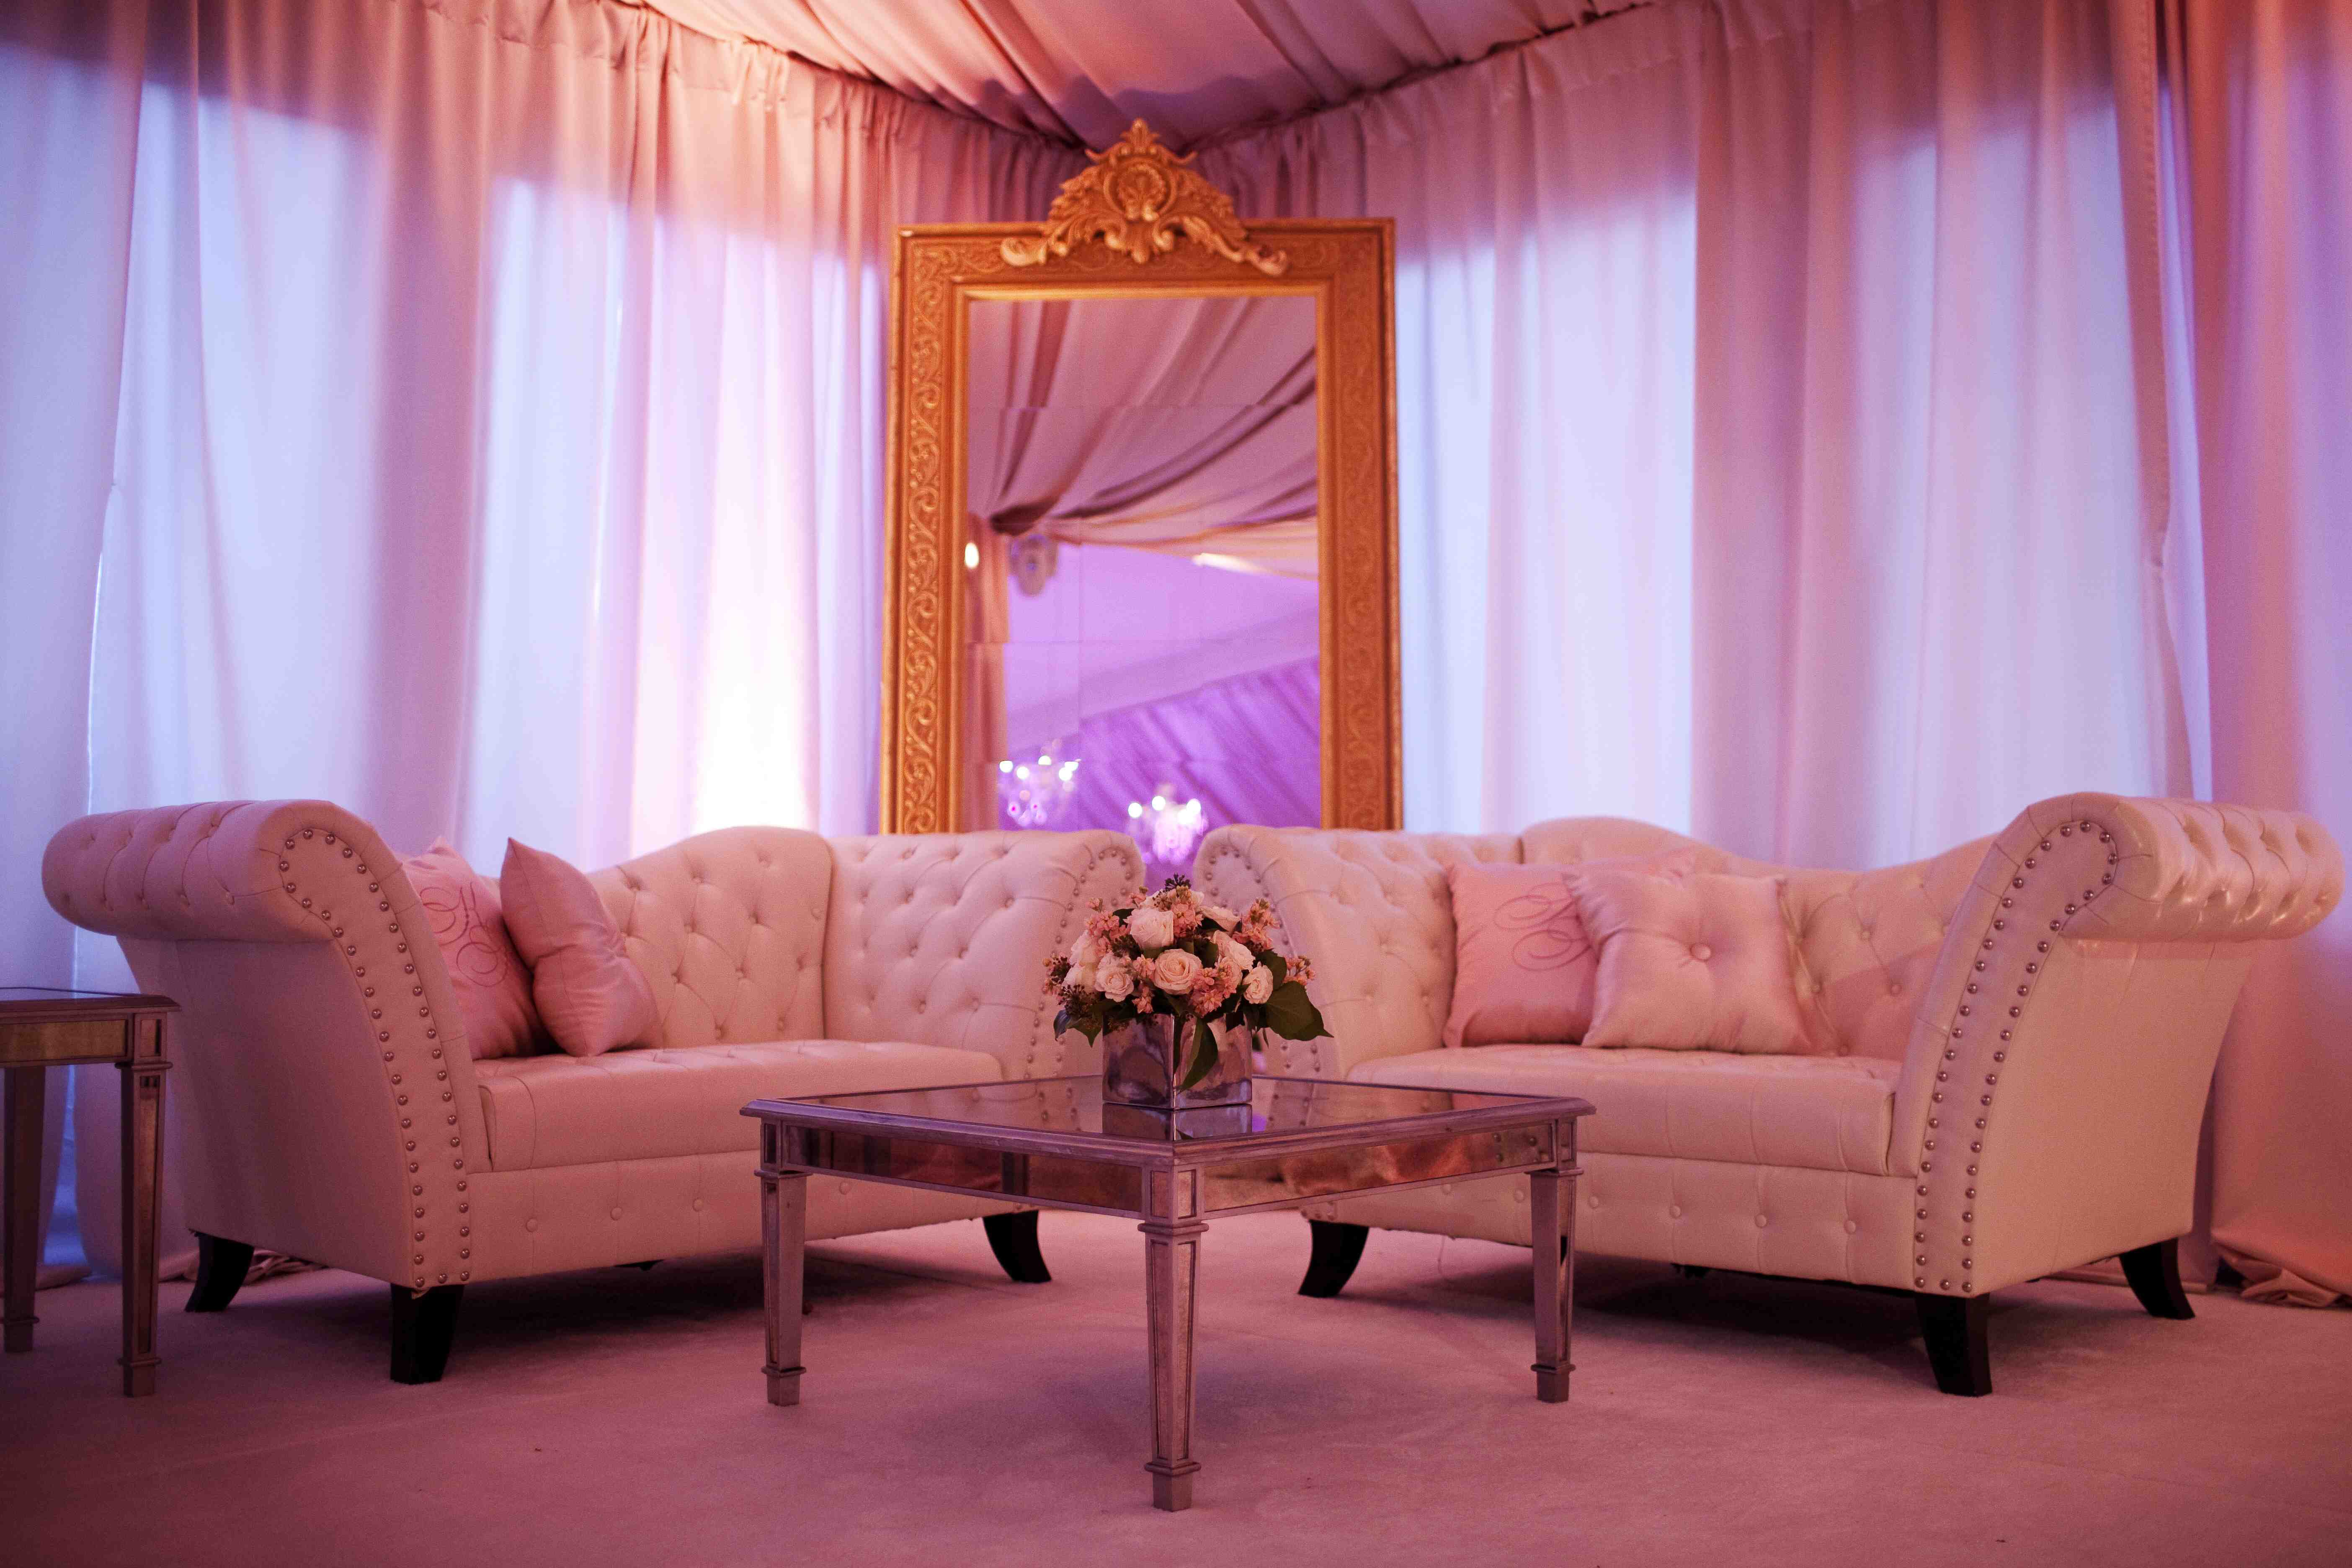 Tufted sofas at wedding lounge